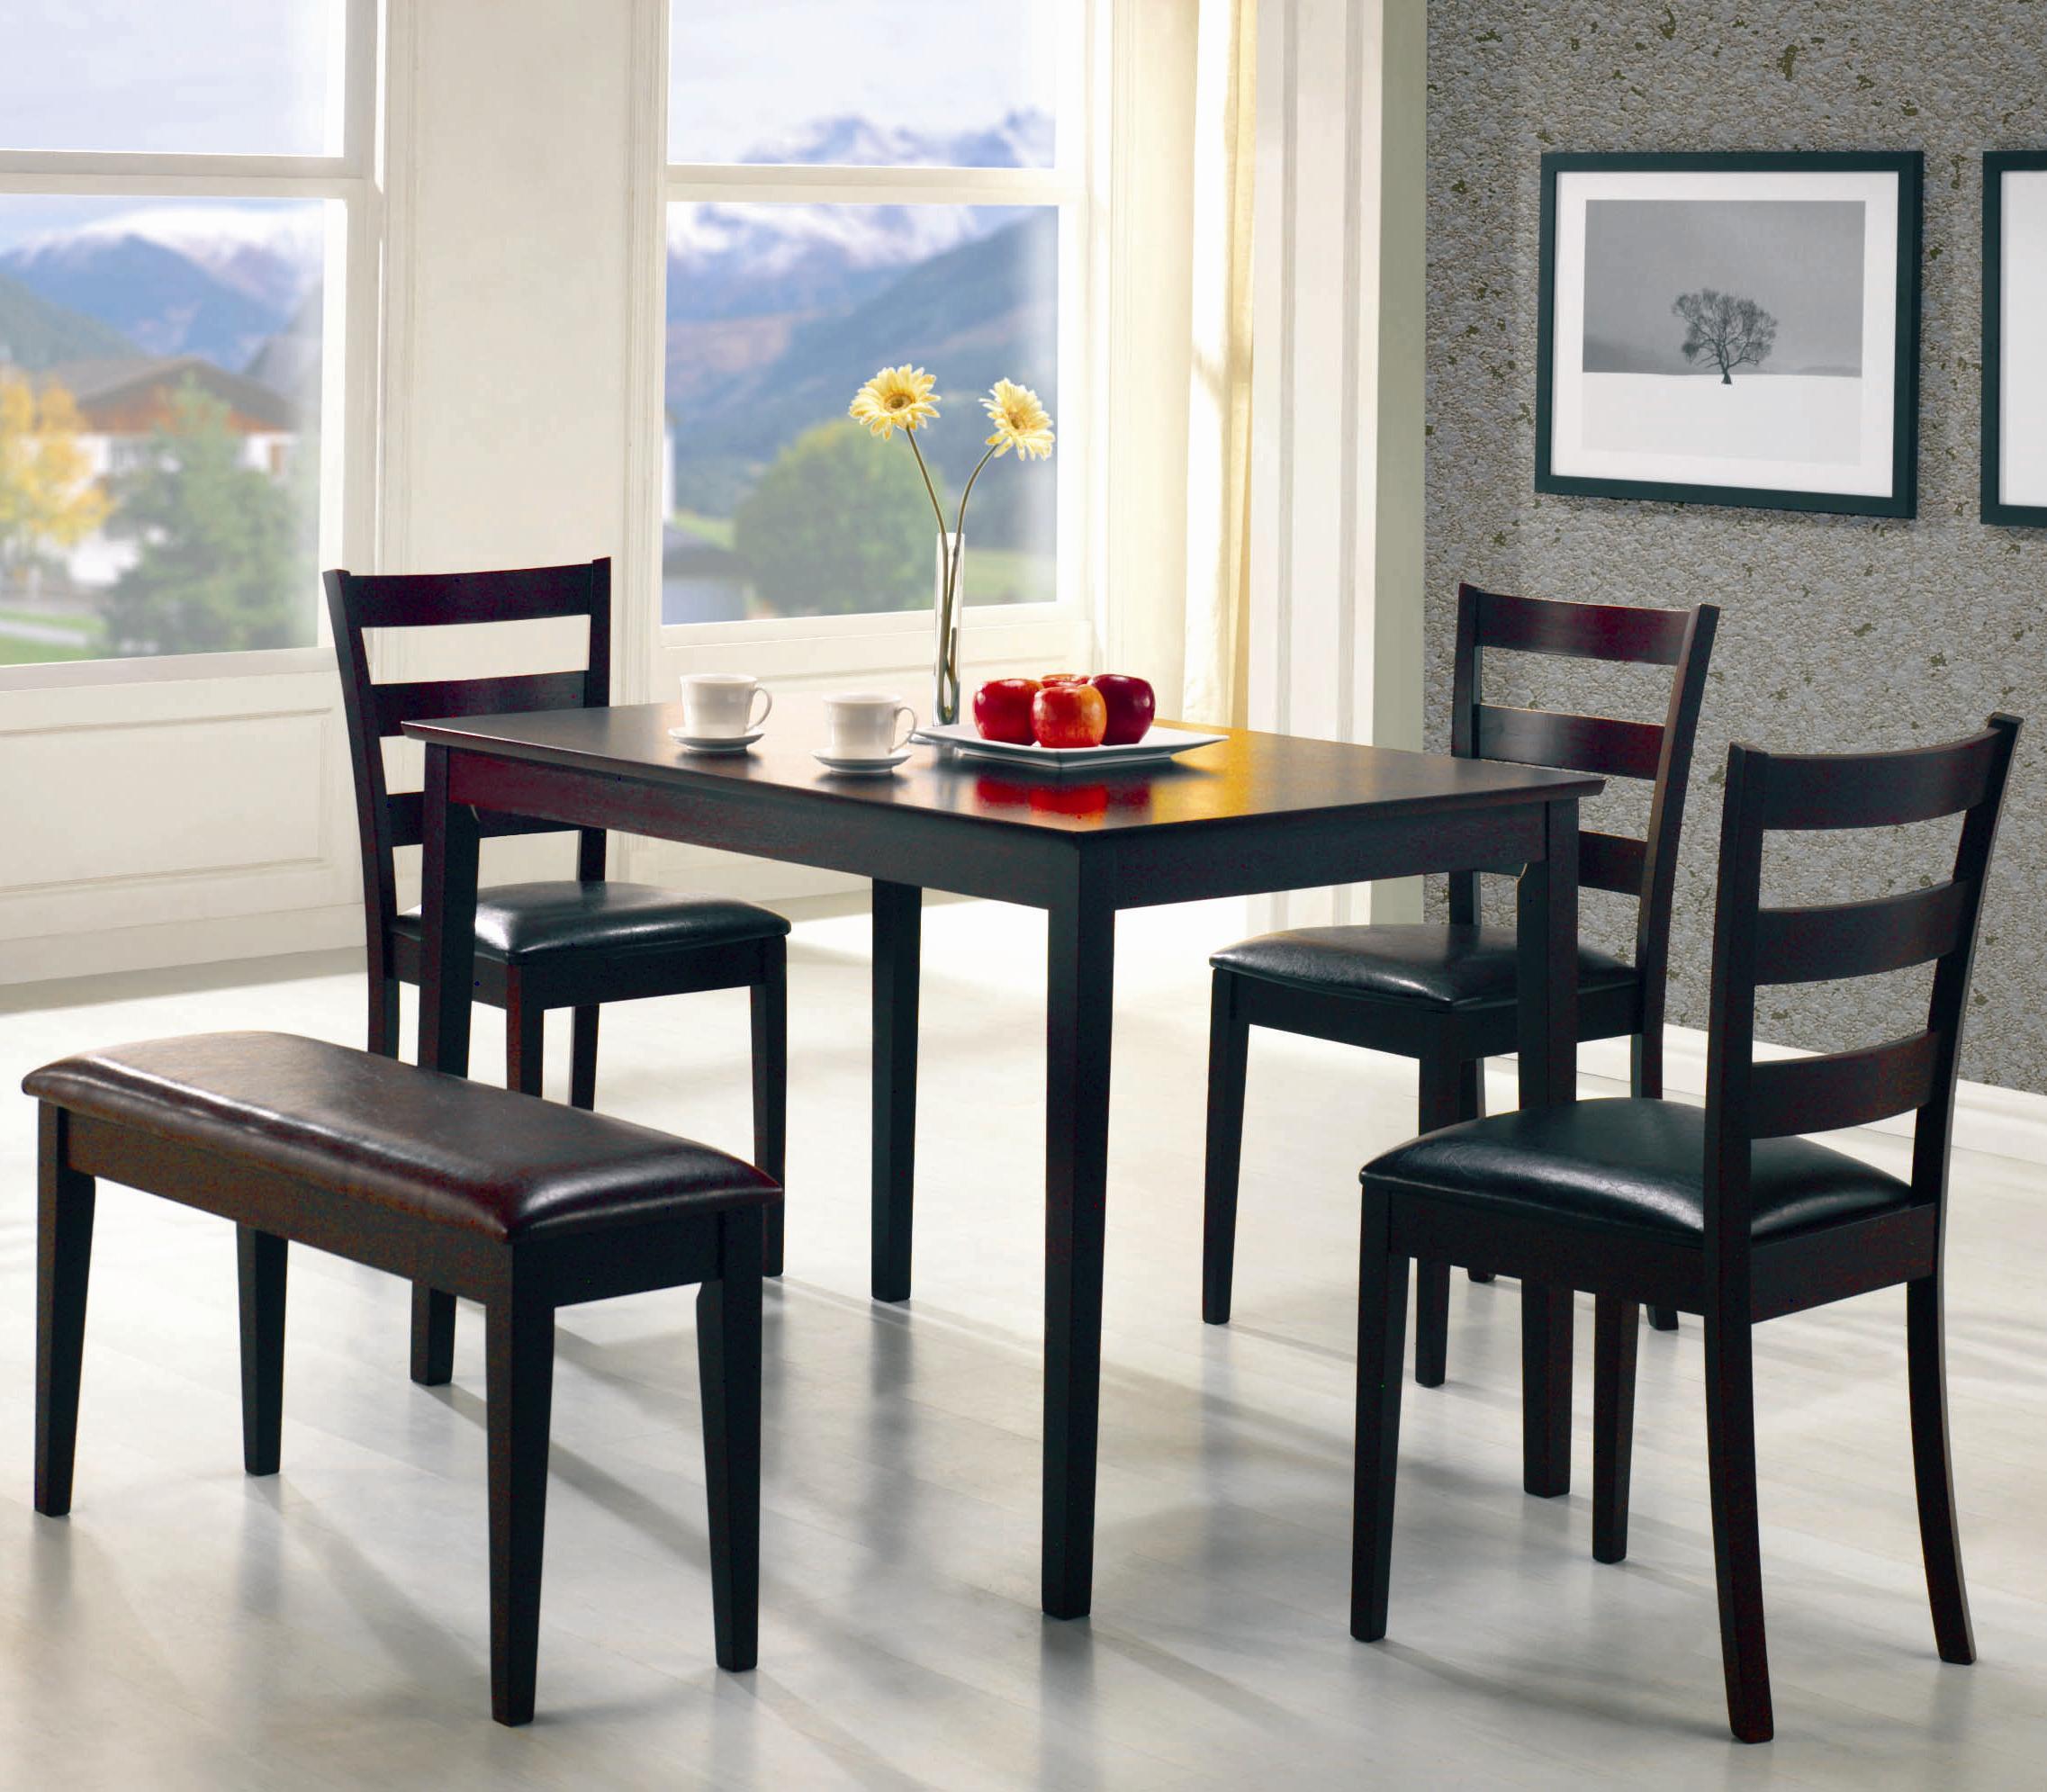 Coaster Taraval 5 Piece Dining Set with Bench - Coaster Fine Furniture